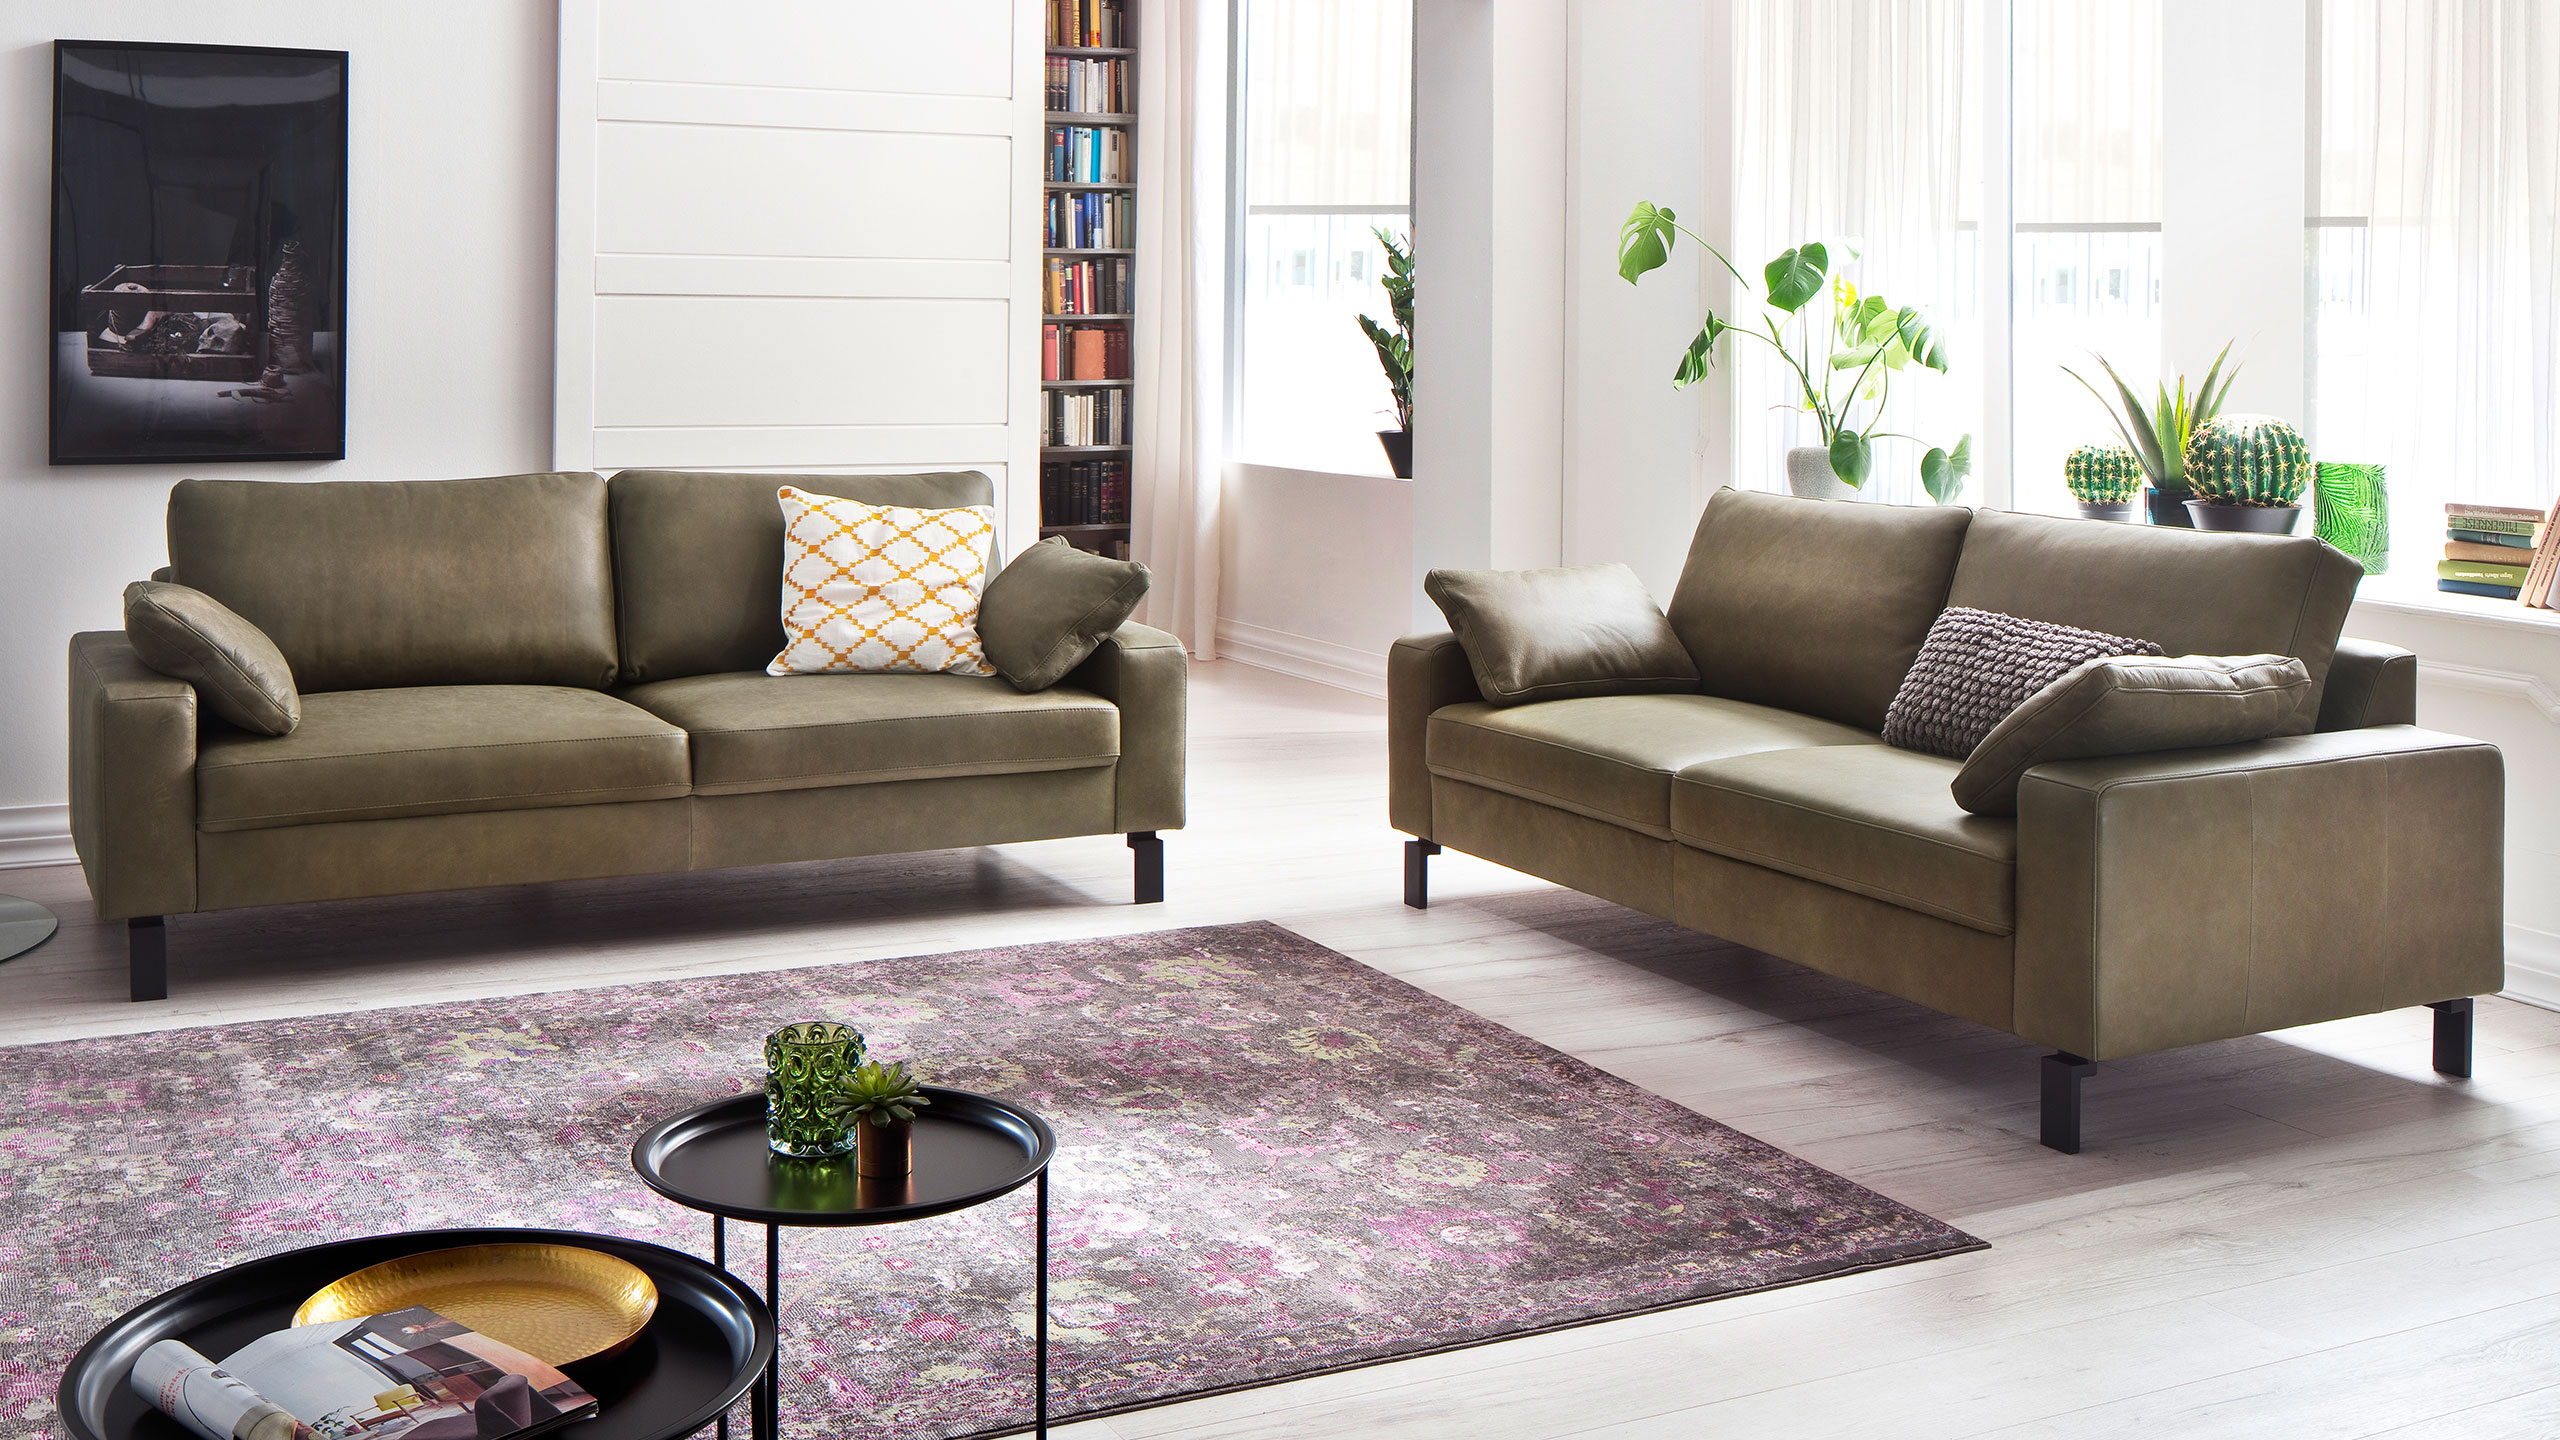 Indiana Sofa Leder Grün